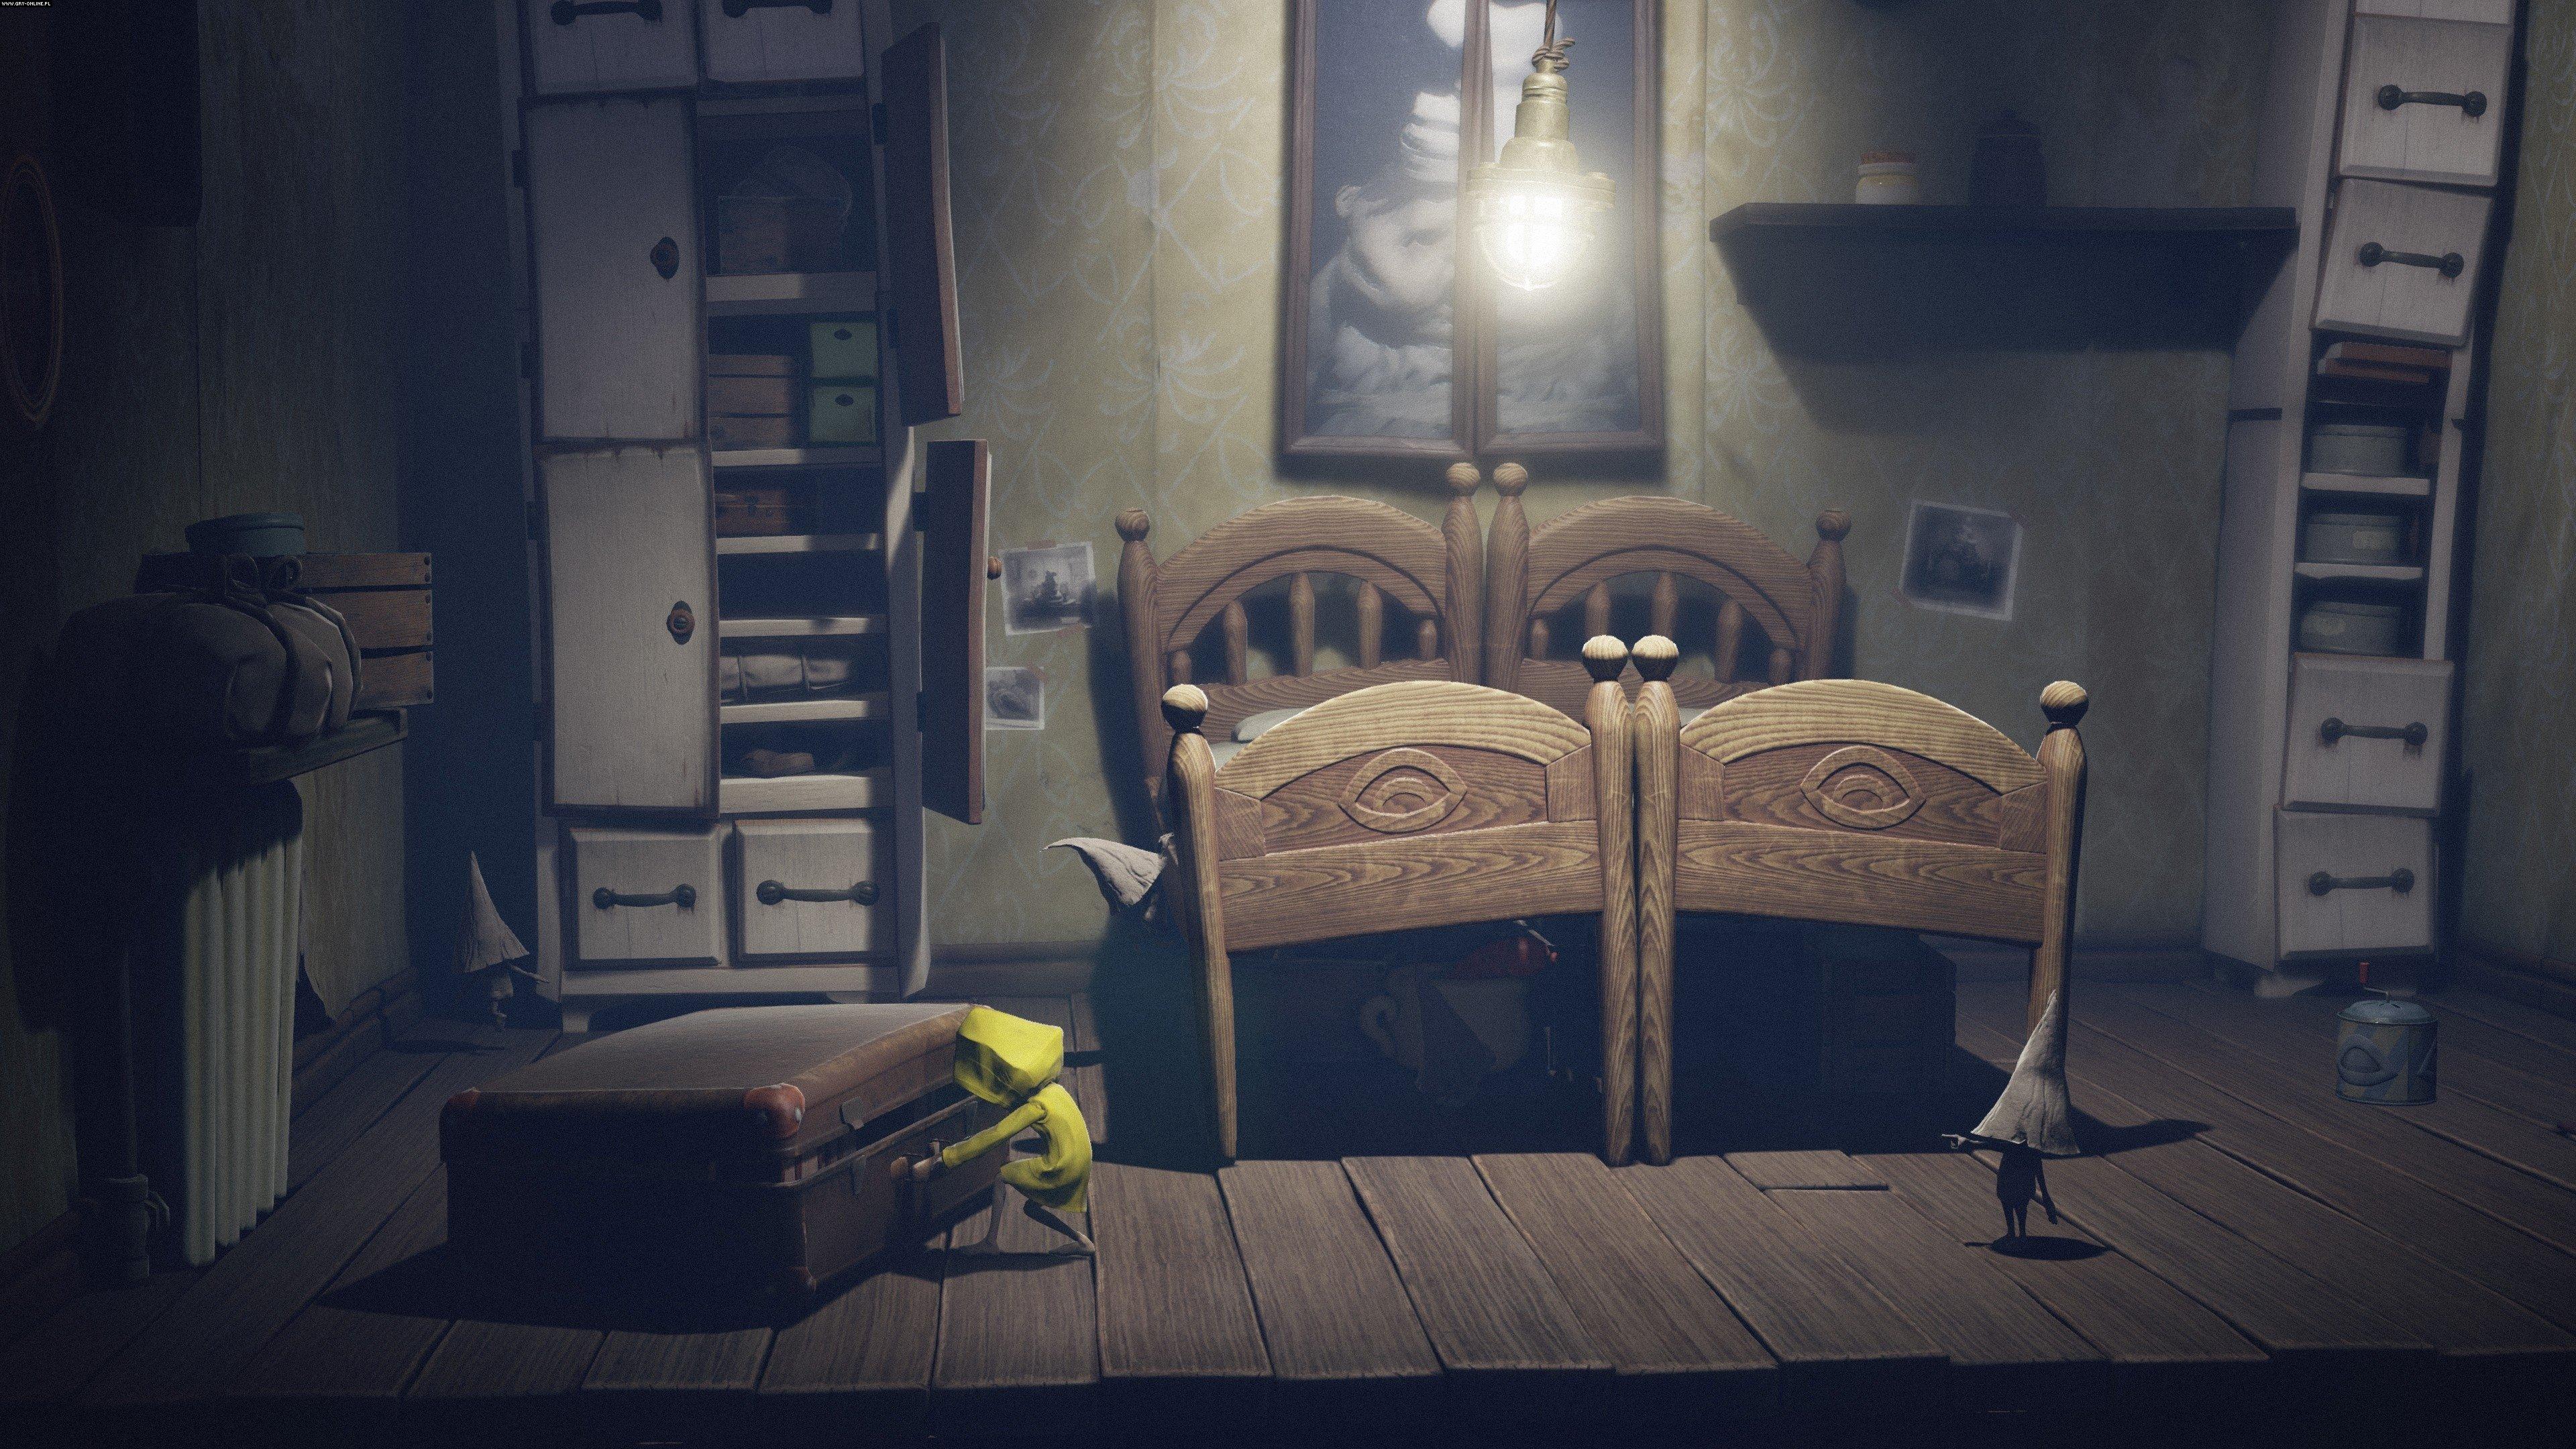 Little Nightmares PS4 Games Image 6/15, Tarsier Studios, Bandai Namco Entertainment